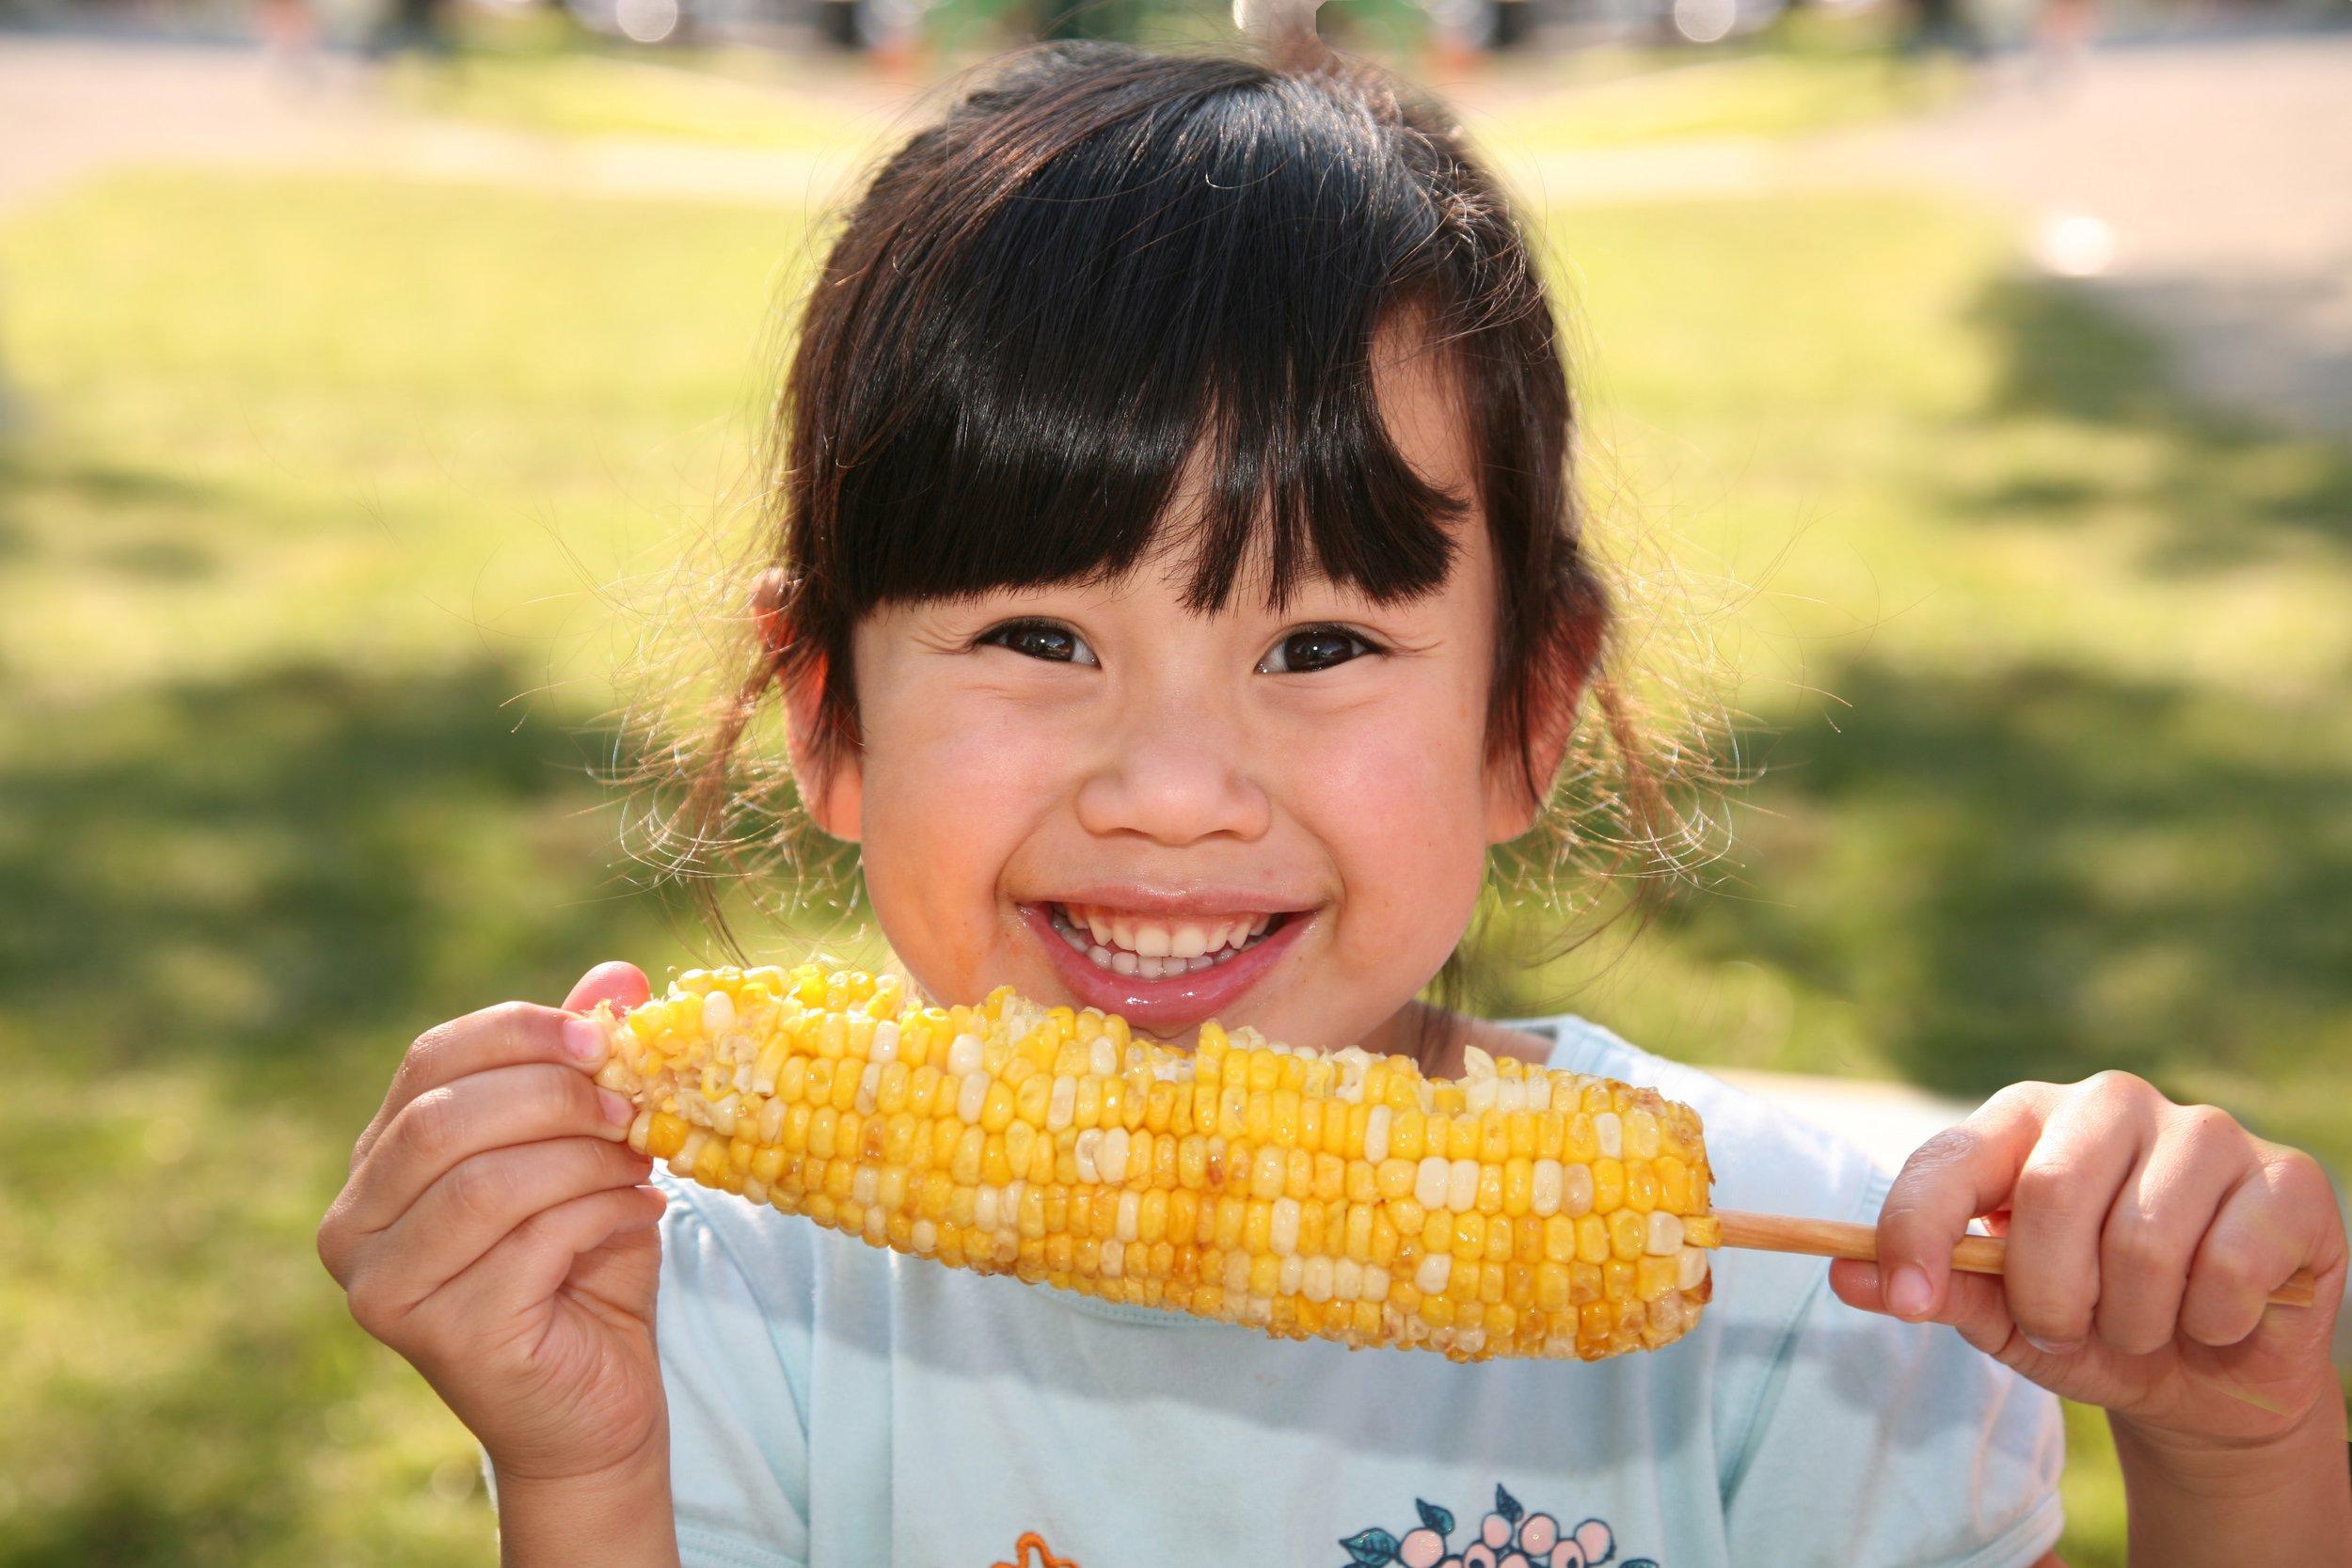 Corn makes everyone happy! :)